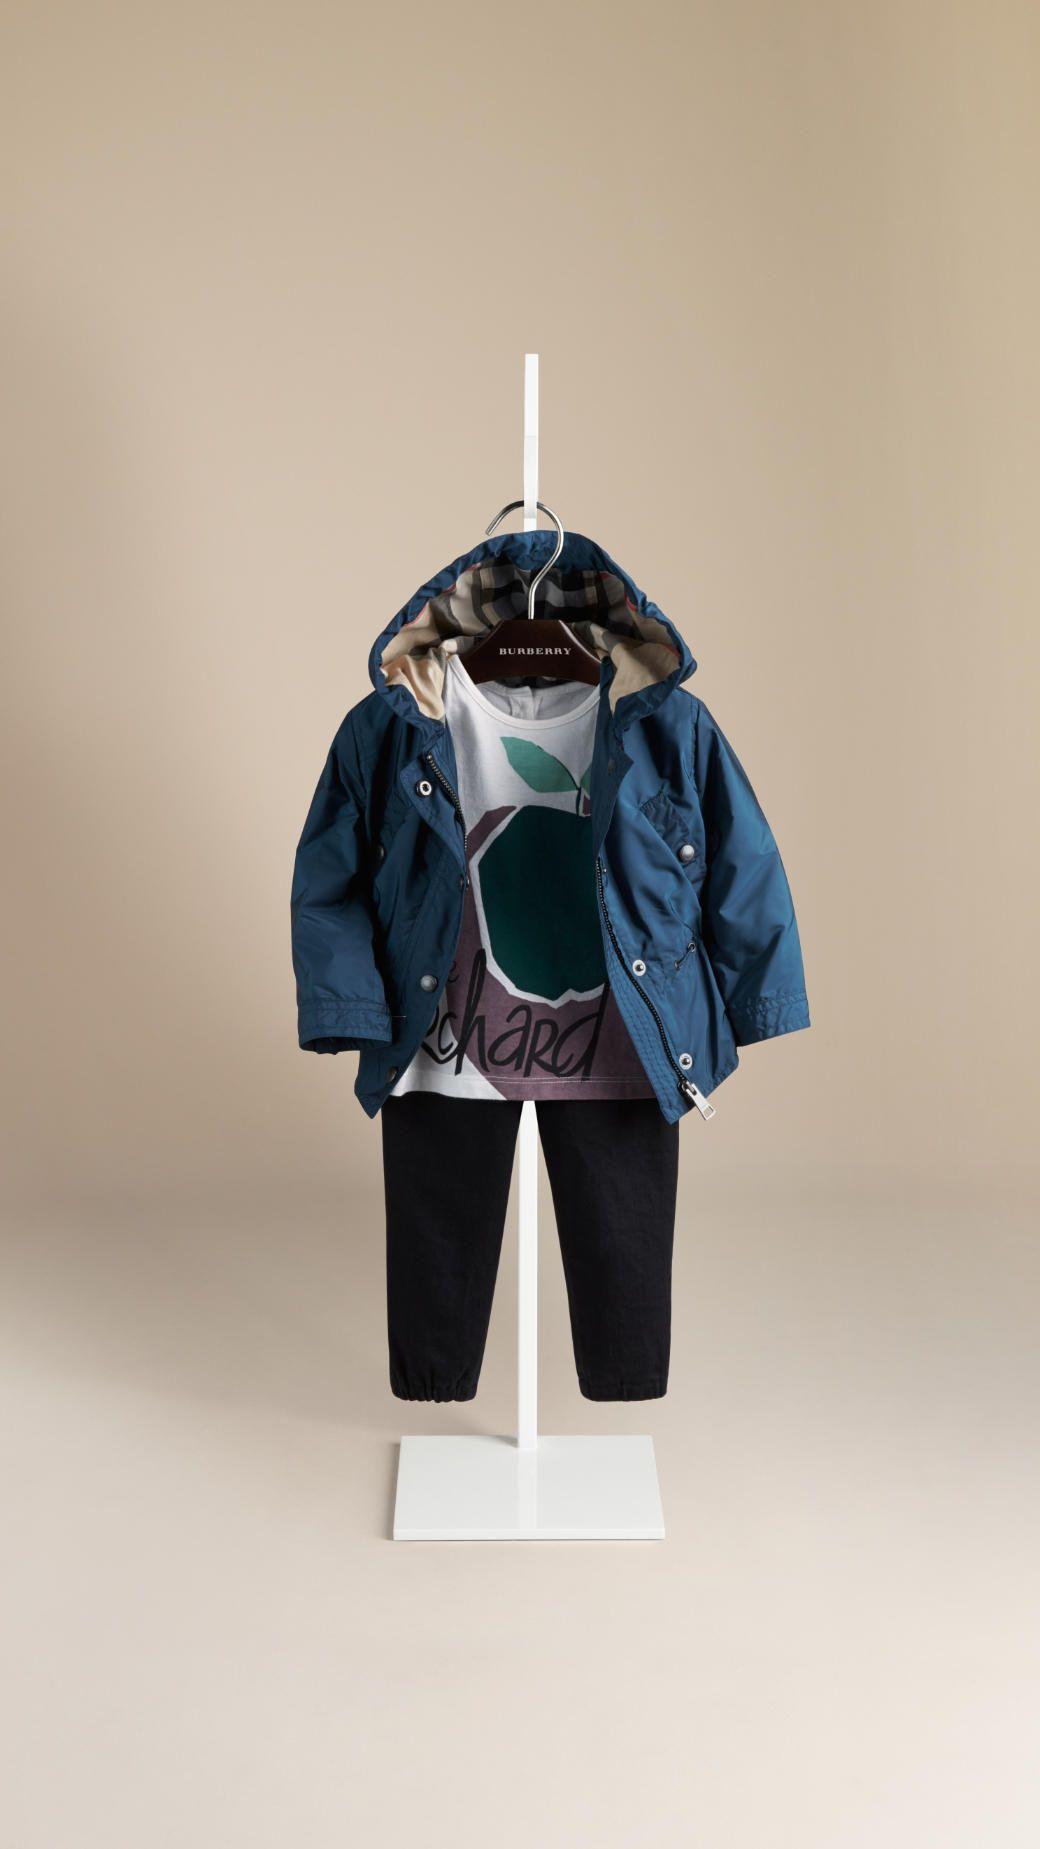 1278c3f0c9d4  burberry kids girl blue jacket for spring 2015  burberry  burberrychildren   SS15  spring  summer  springsummer2015  childrens  kids  childrenswear ...